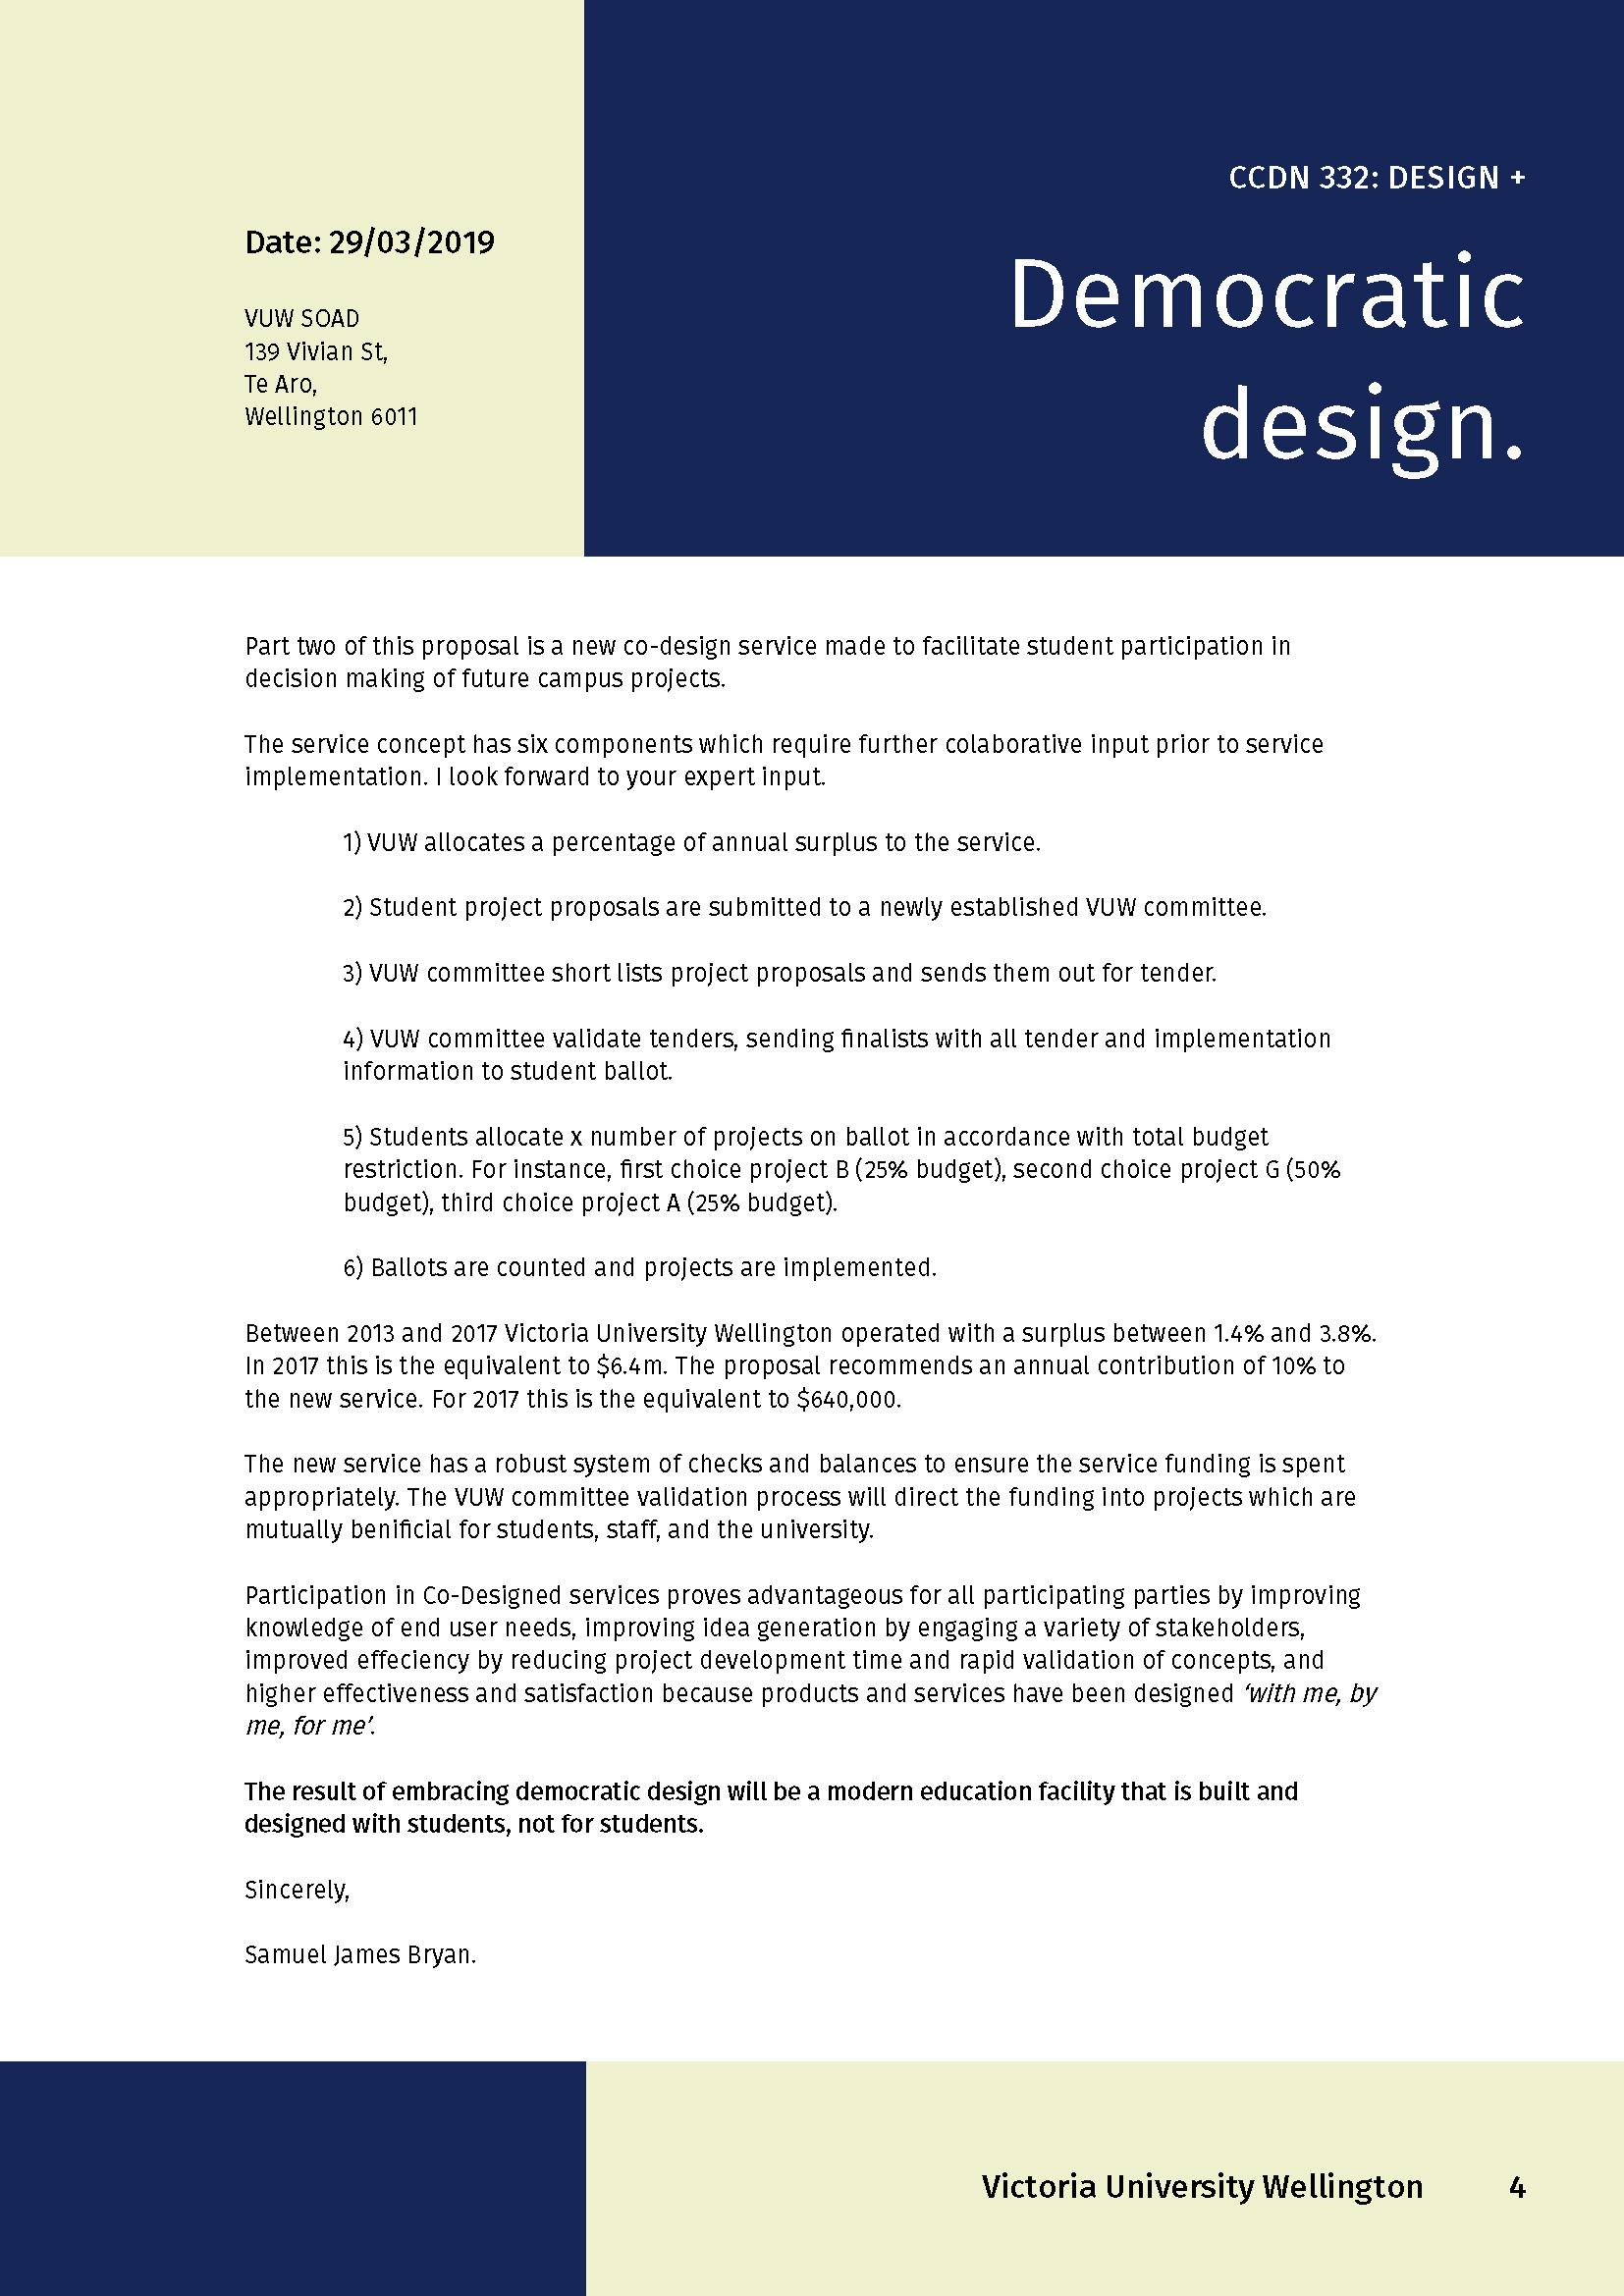 Samuel Bryan CCDN332 Project One Page 04.jpg